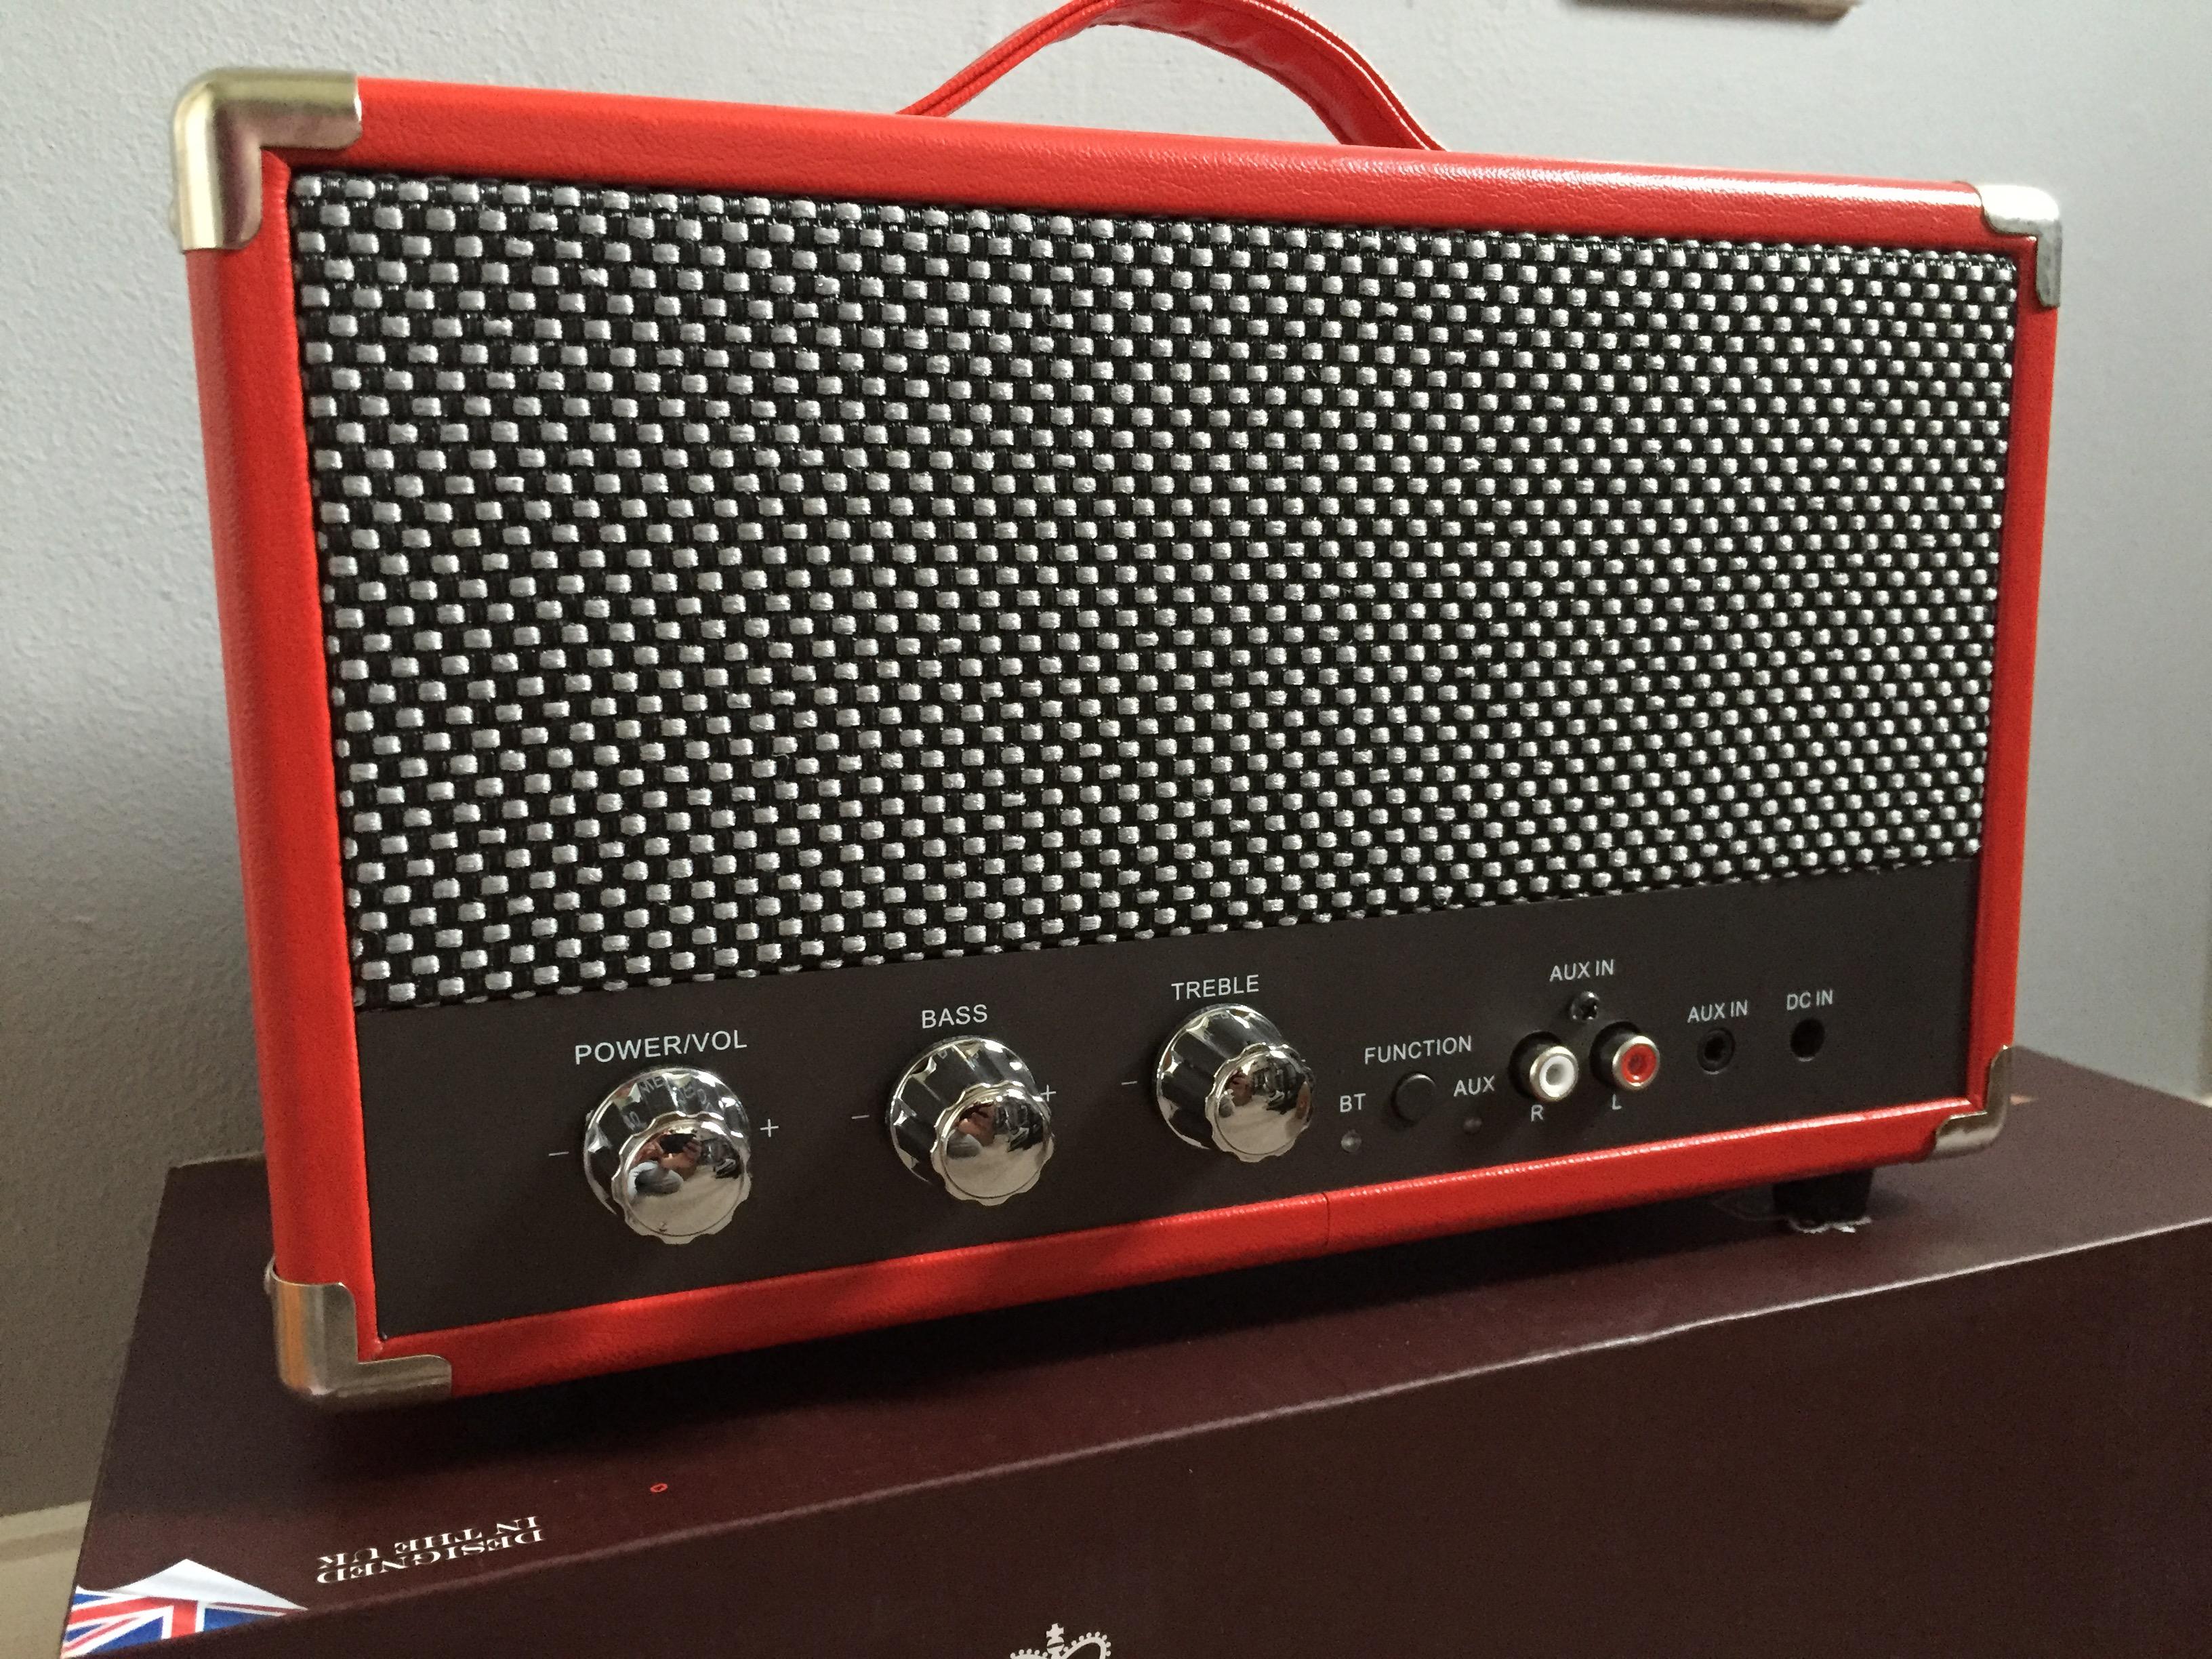 GPO Westwood Retro Speaker Review    TechNuovo.com 9d6a186b3362d